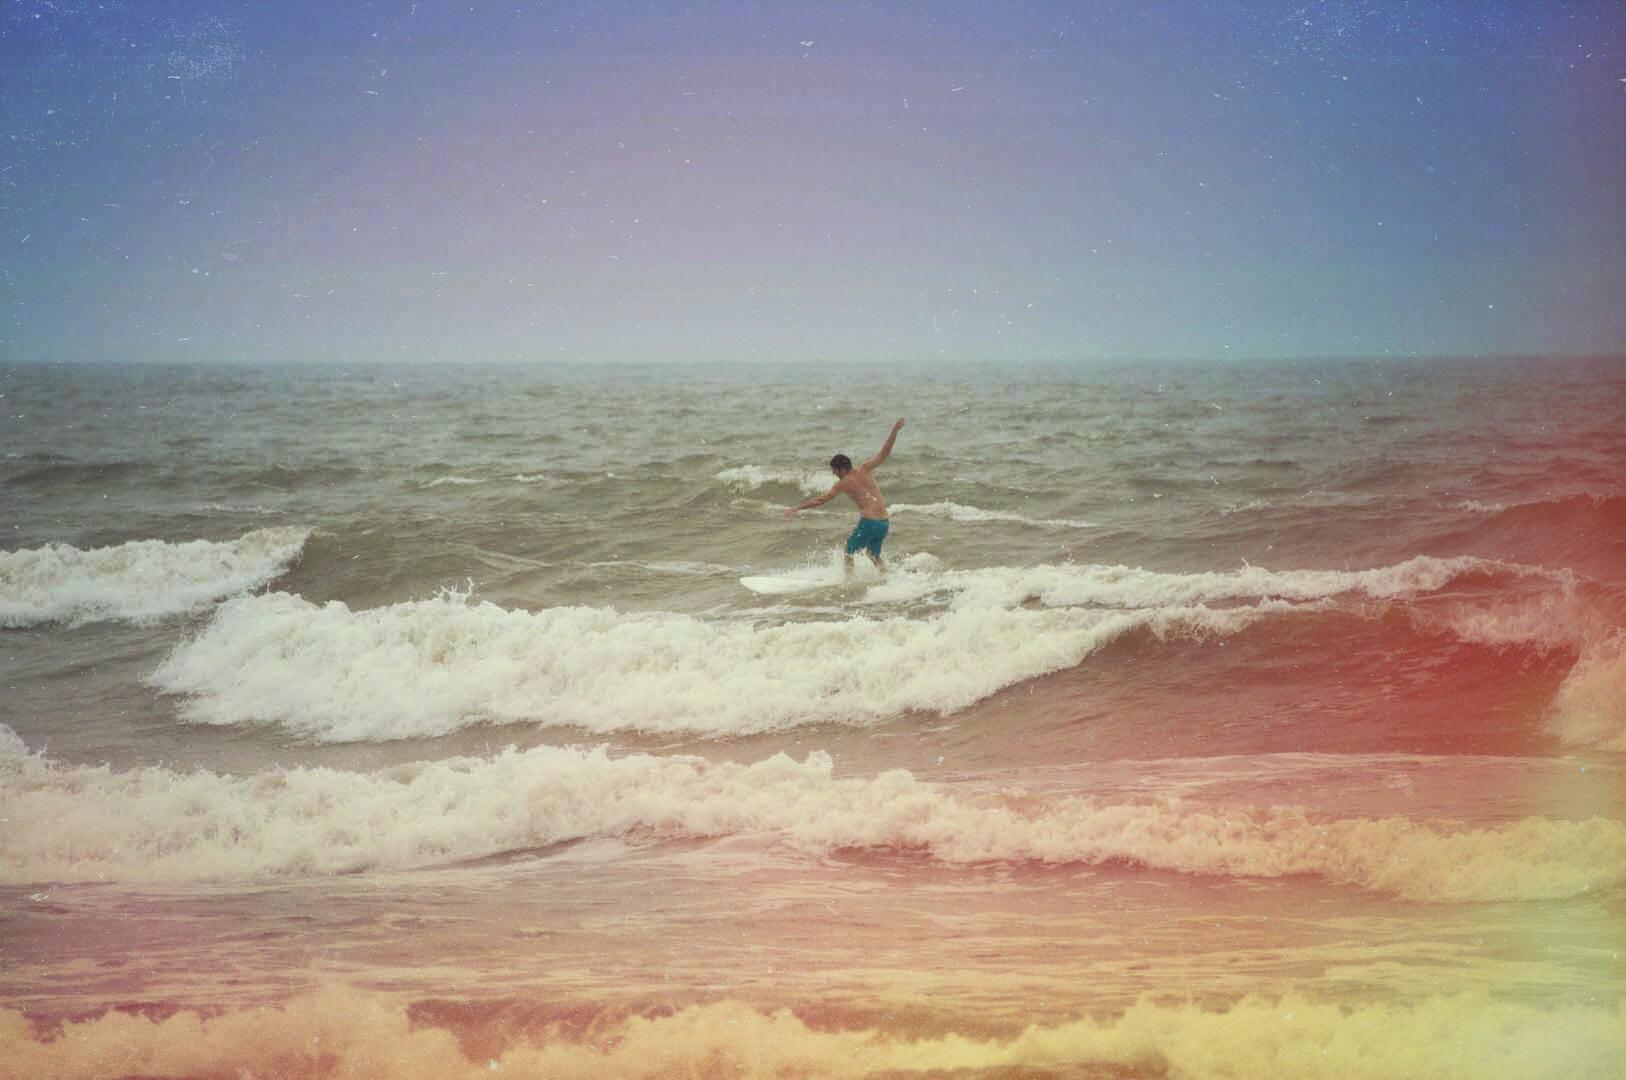 light leak surfing photo